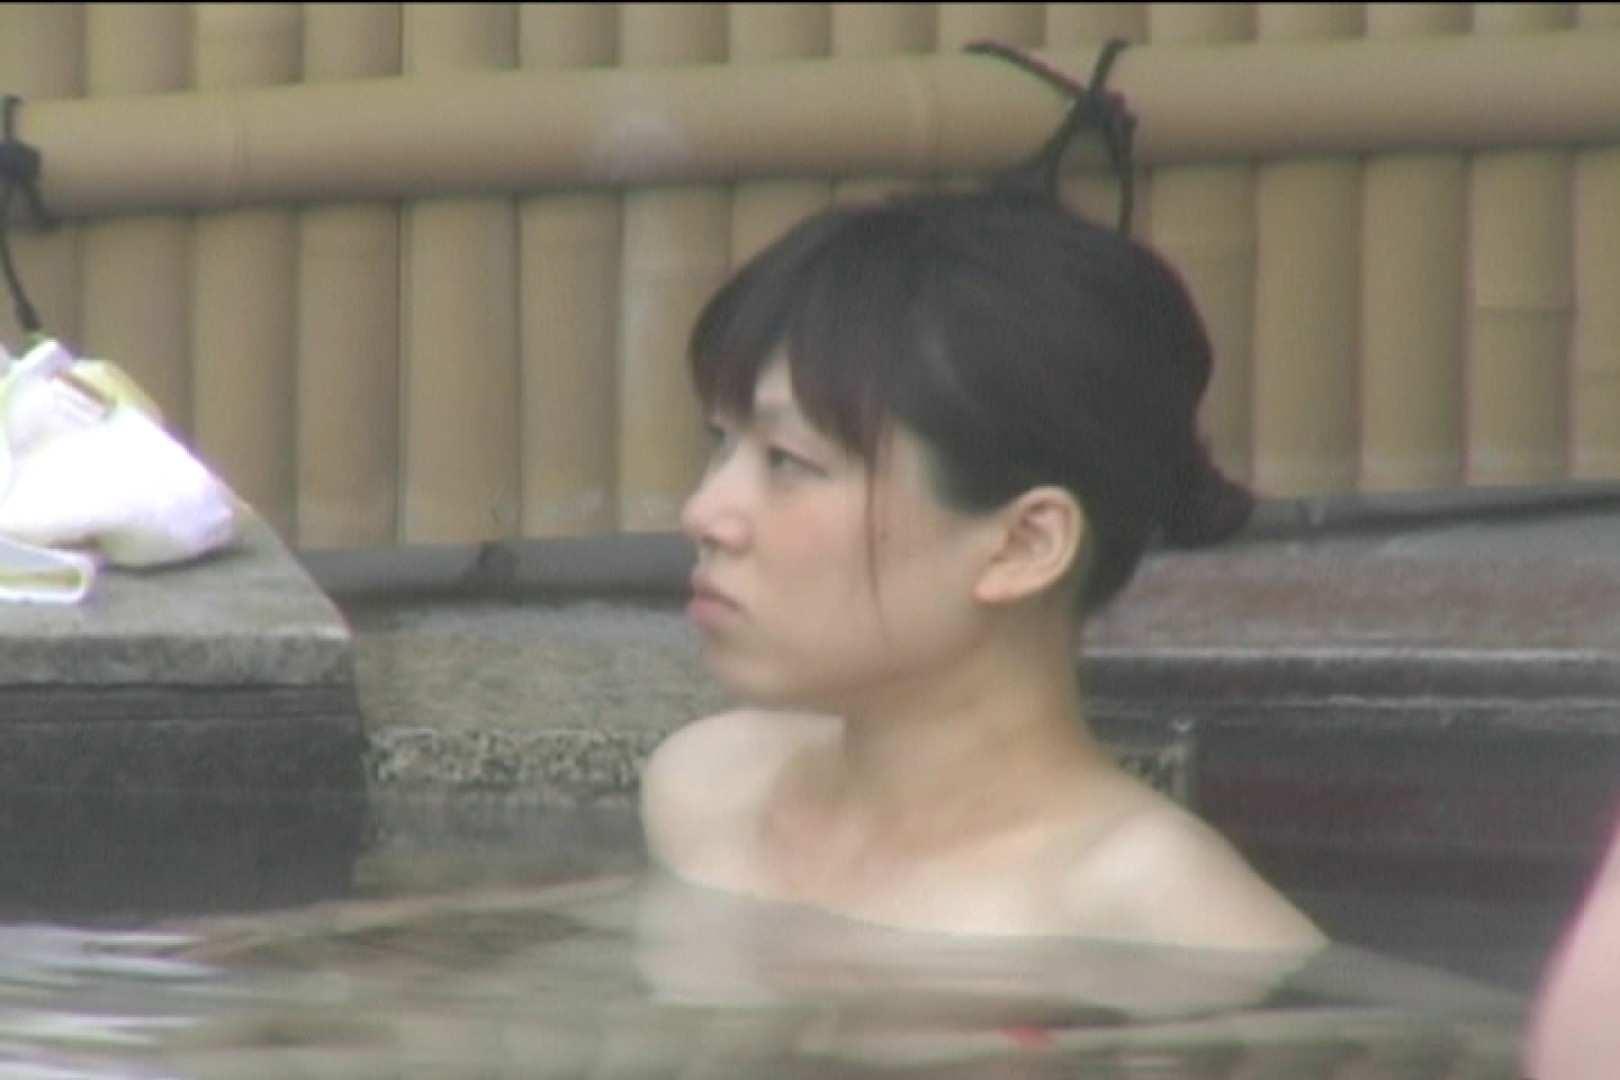 Aquaな露天風呂Vol.121 露天 | OL女体  89連発 40